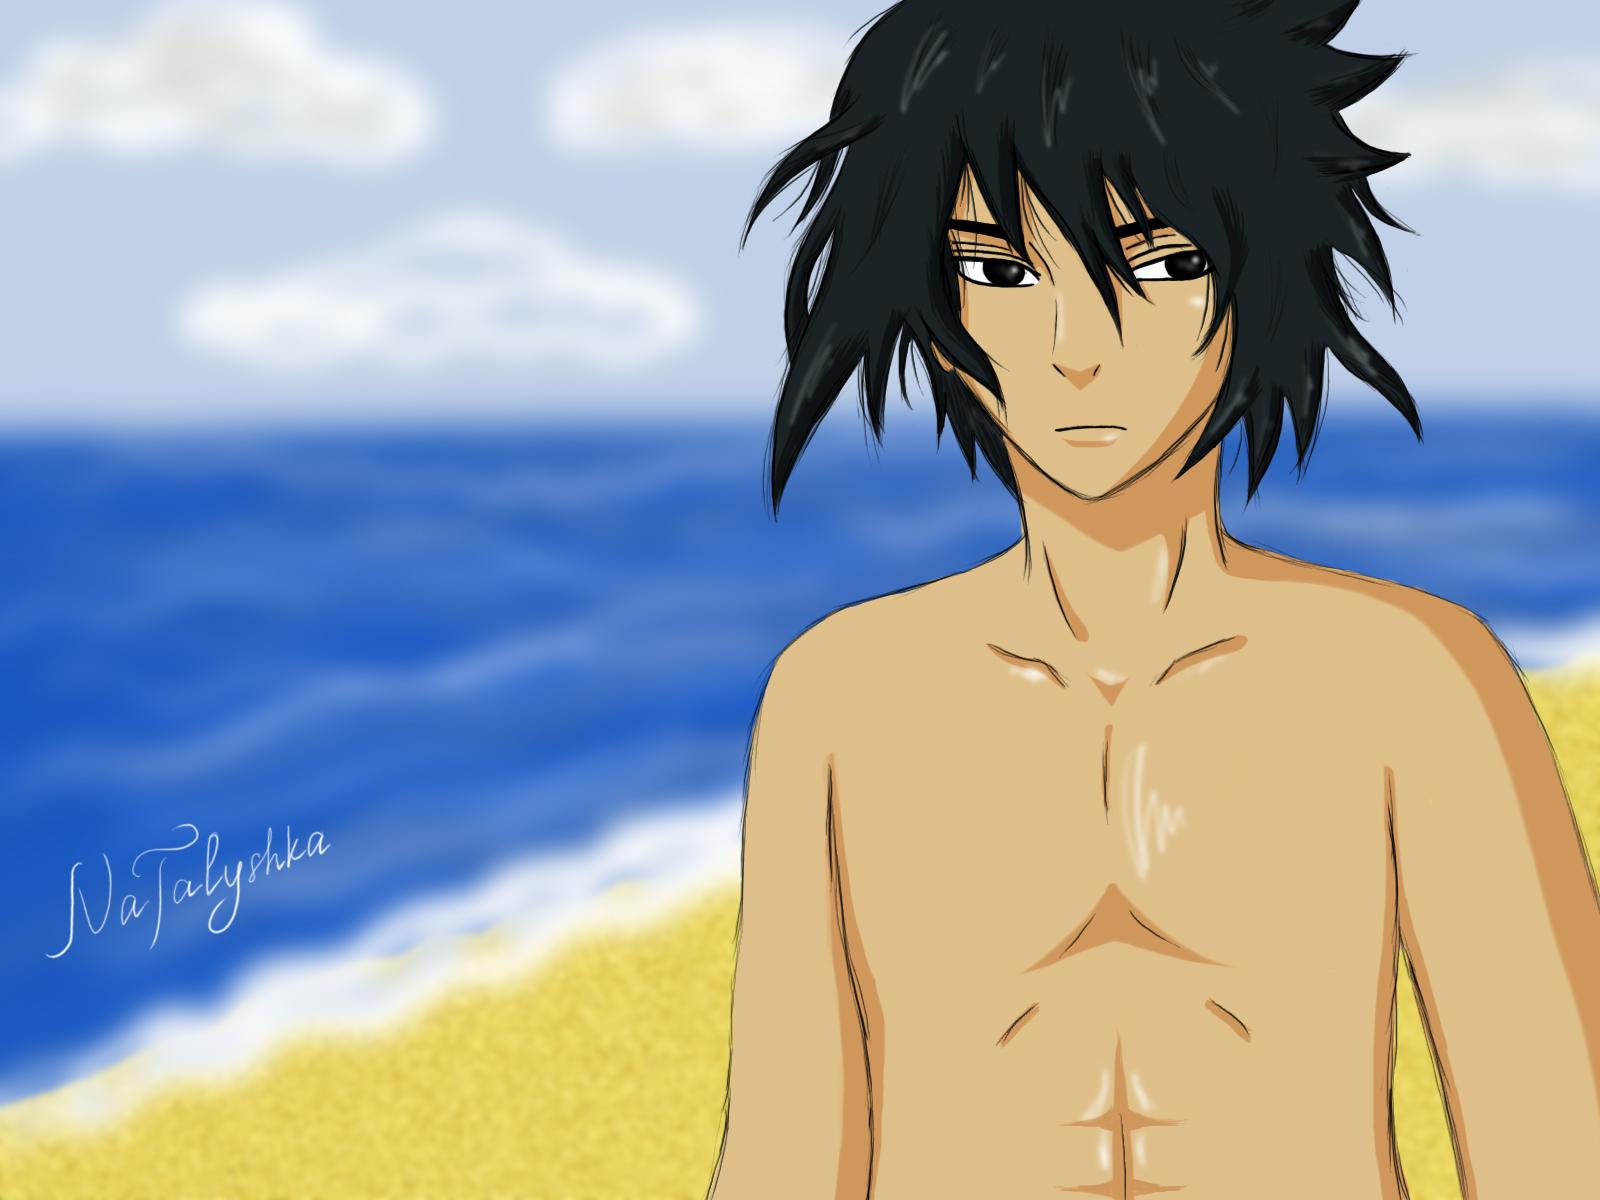 Naruto - Sasuke on the Beach by NaTalyshka